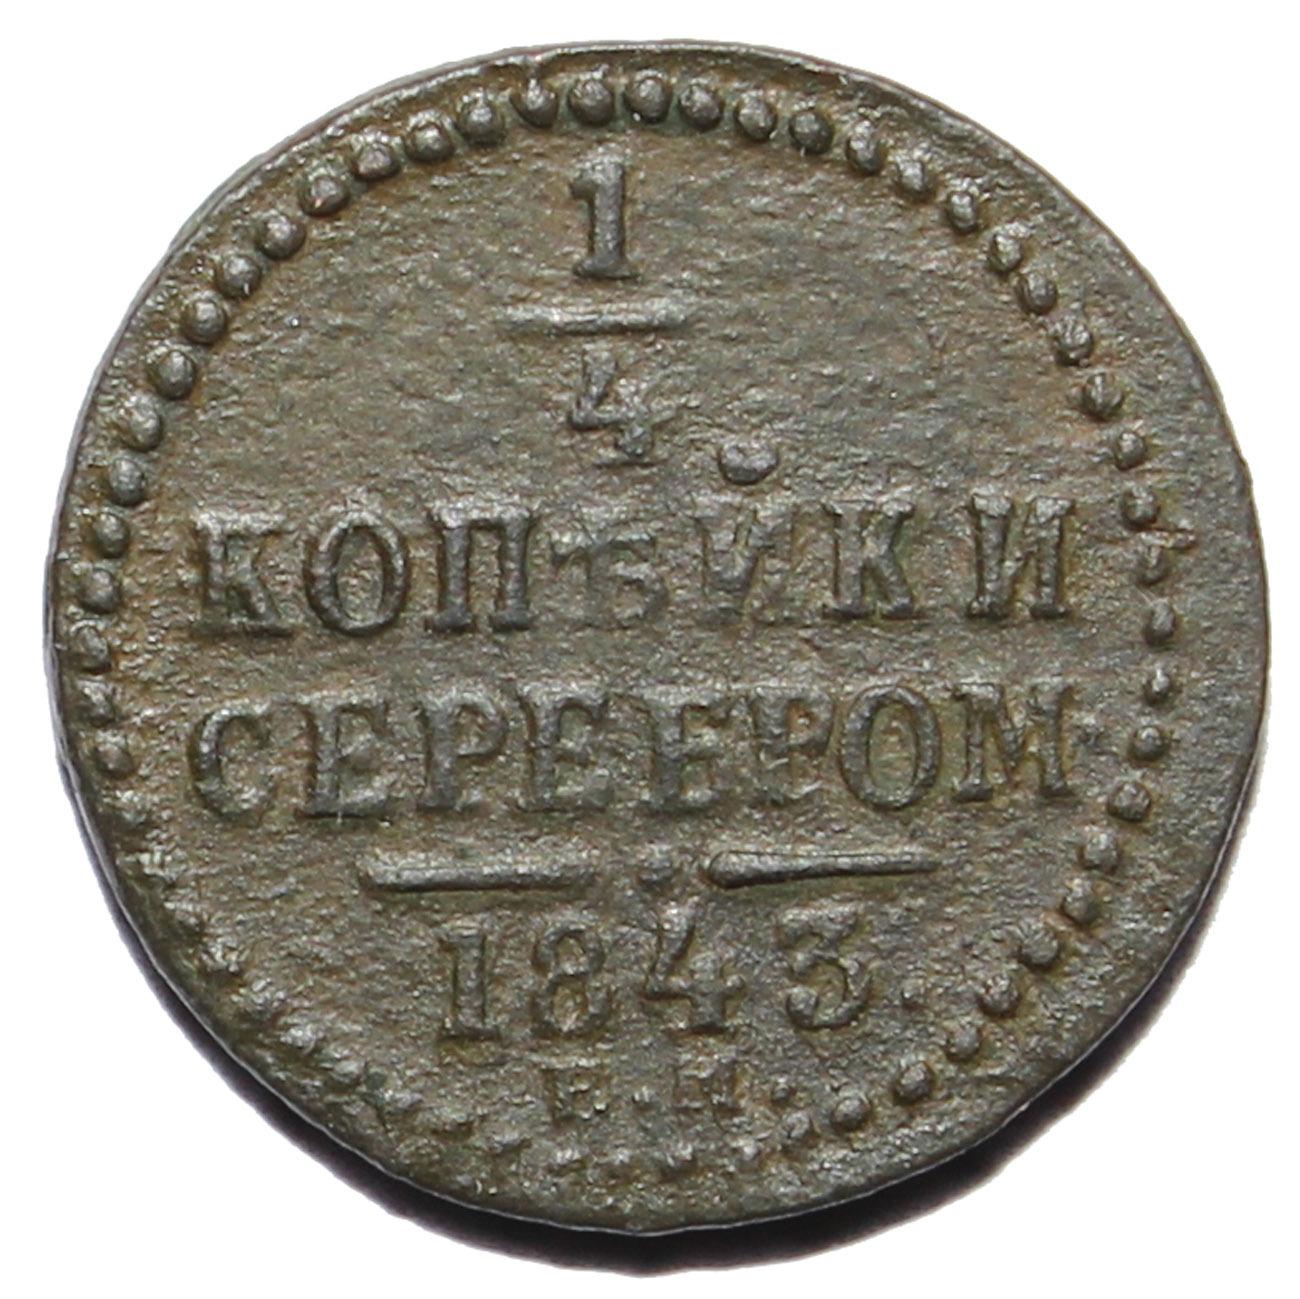 1/4 копейки серебром 1843 год. ЕМ. Николай I. VF-